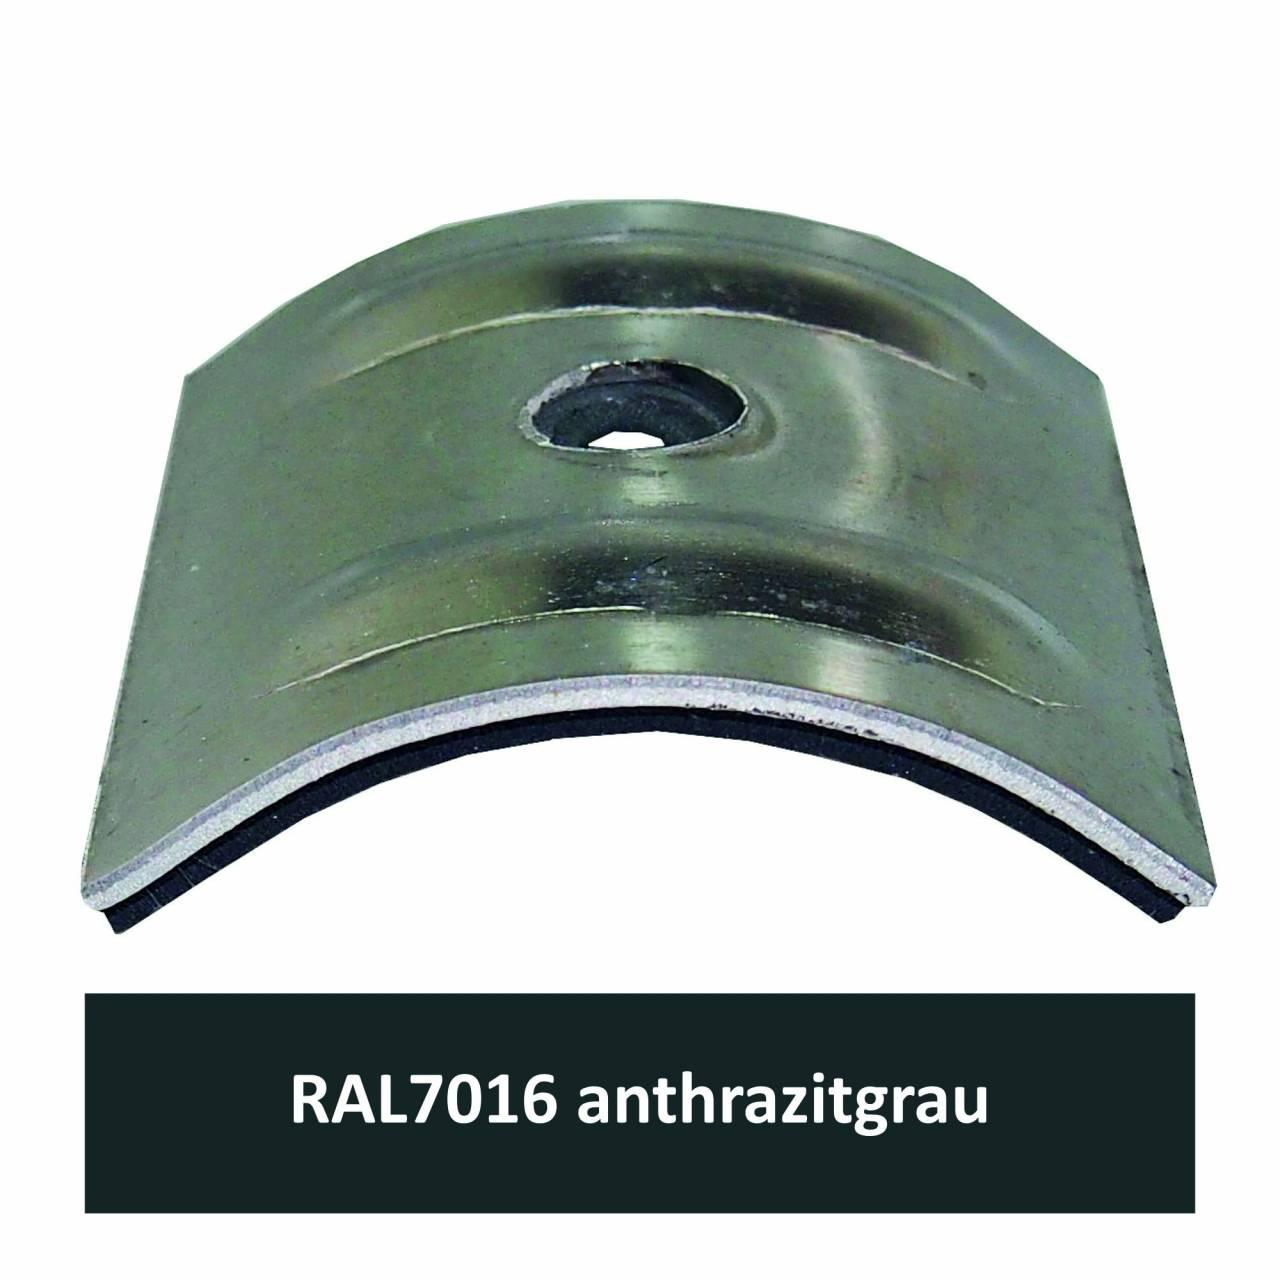 Kalotten für Welle 18/76, Alu RAL7016 anthrazitgrau / Pck a 100 Stück